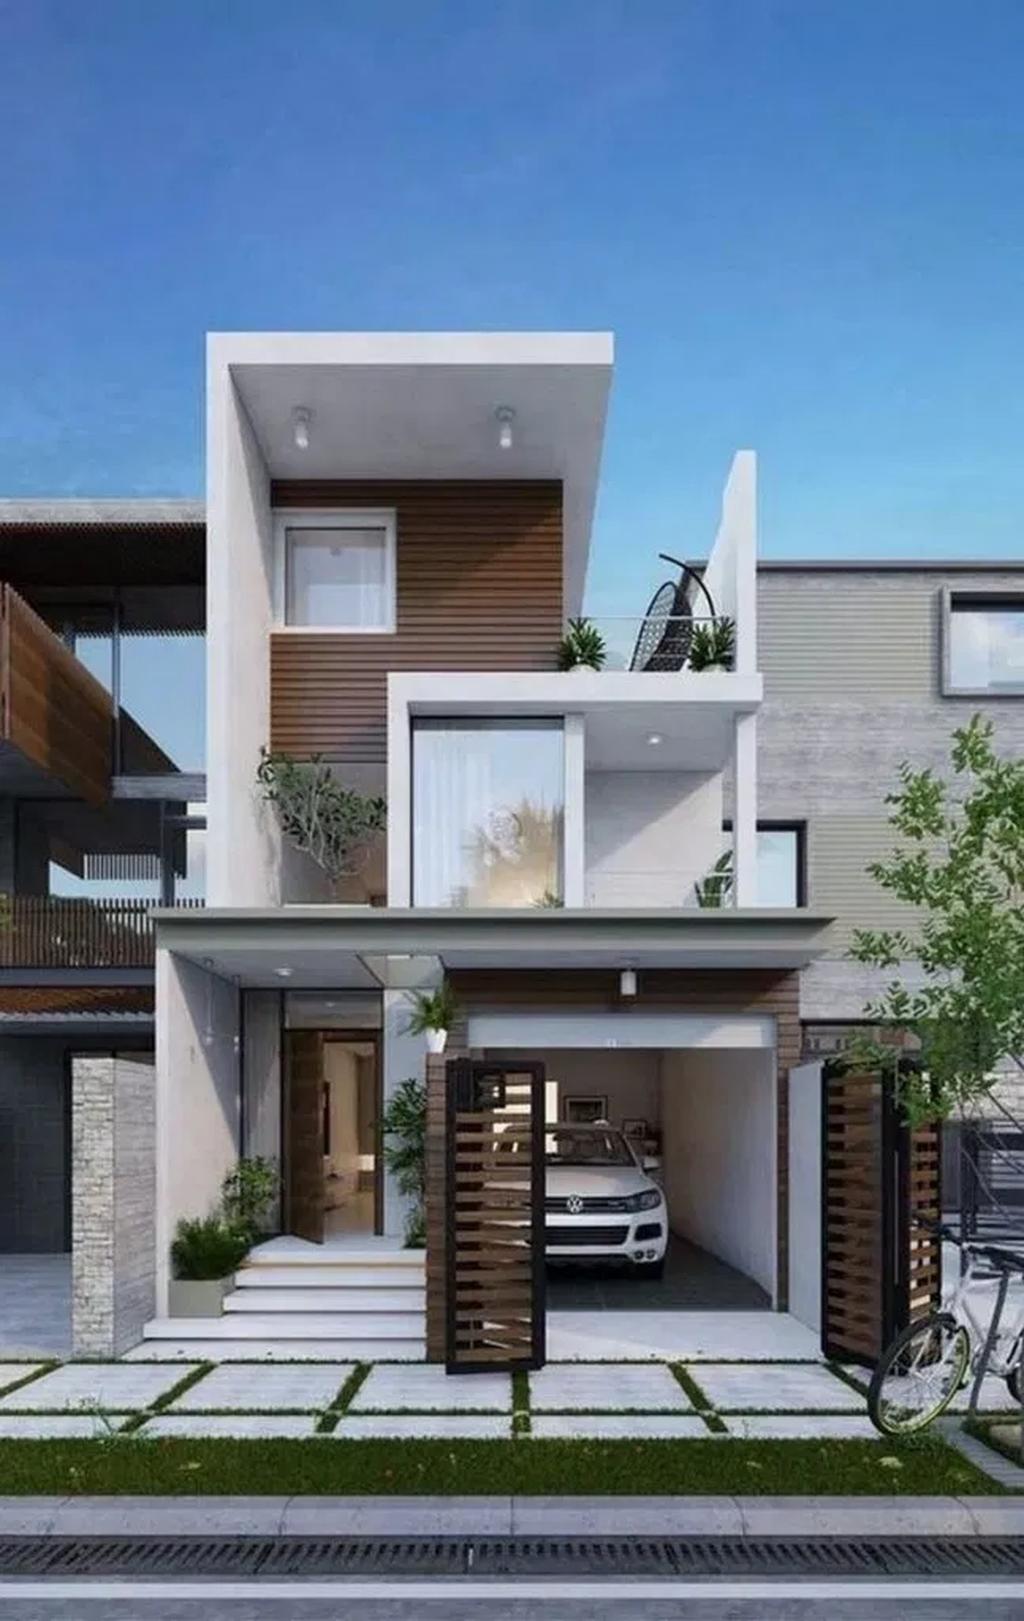 33 Inspiring Modern Minimalist House Design Ideas Small House Exteriors Contemporary House Exterior Modern Minimalist House